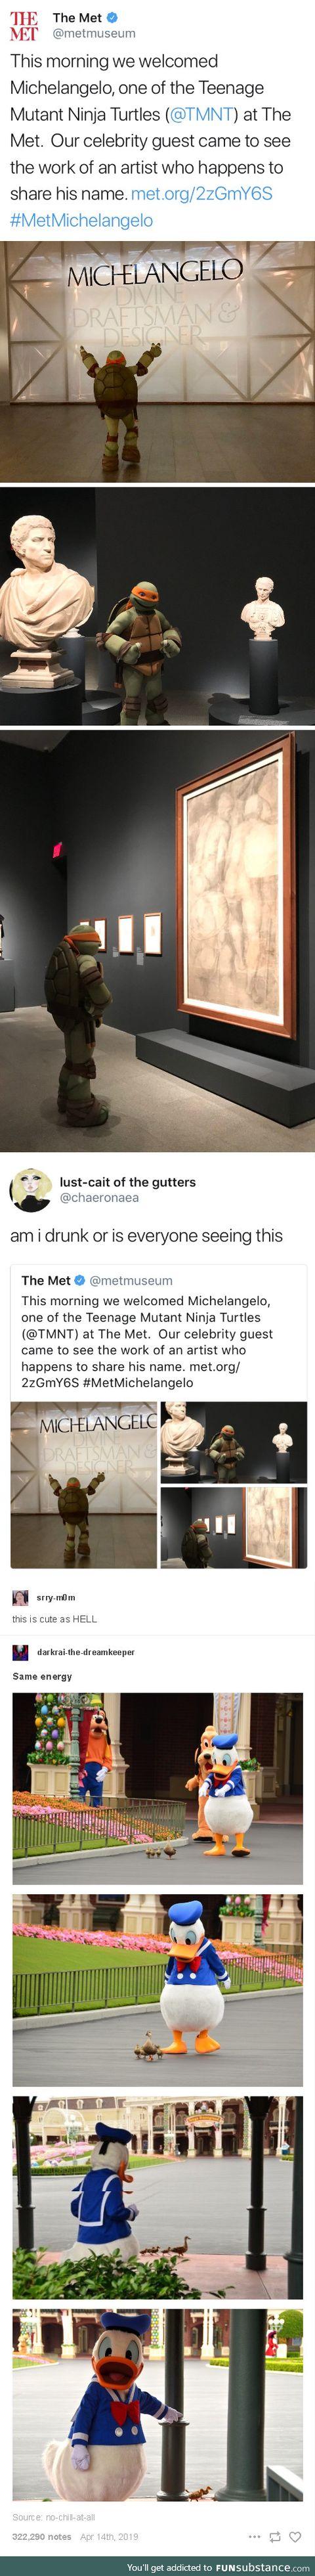 *Insert Ninja Turtle catch phrase here*